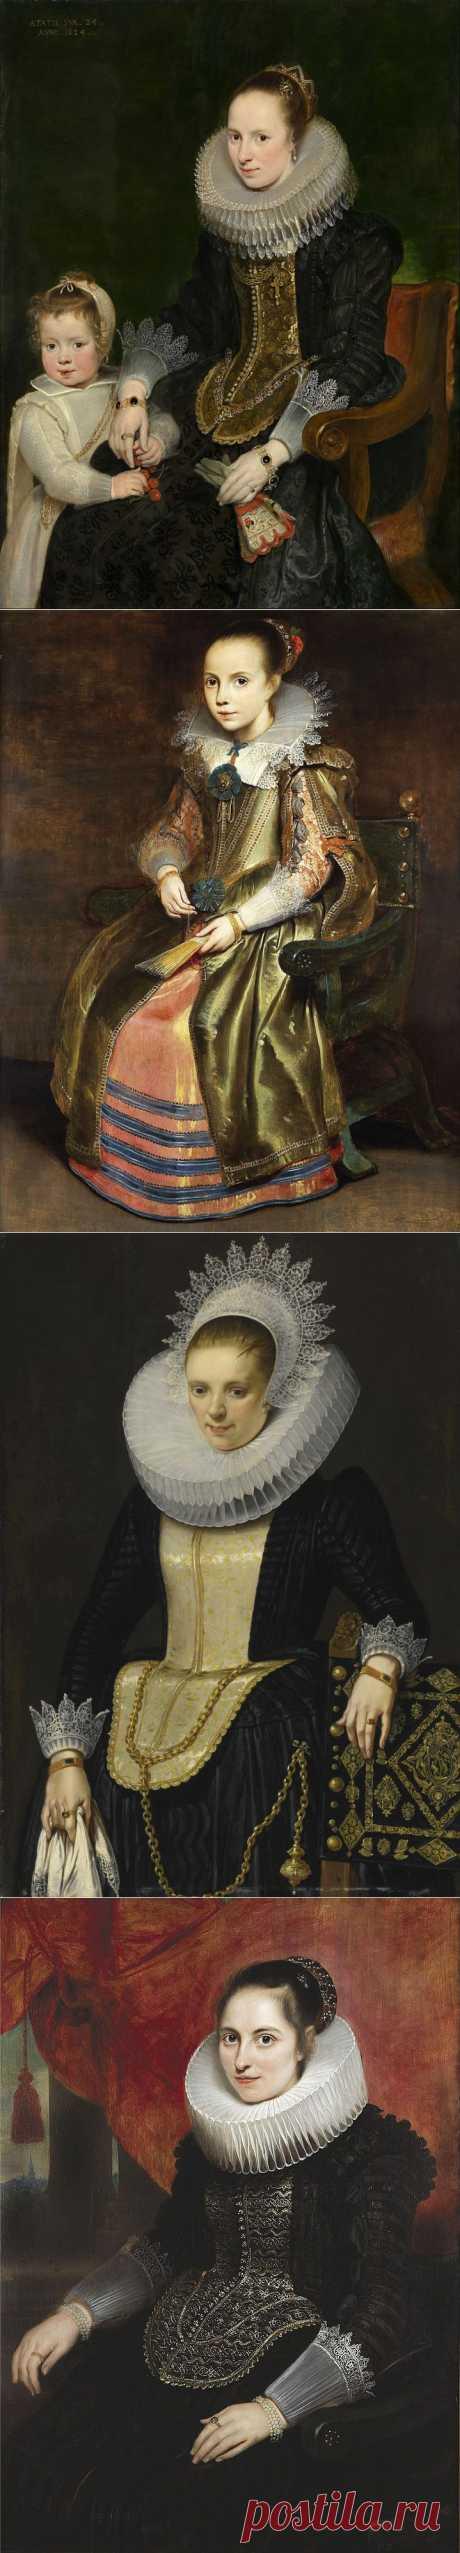 Фламандский художник-портретист Корнелис Де Вос (1584–1651)